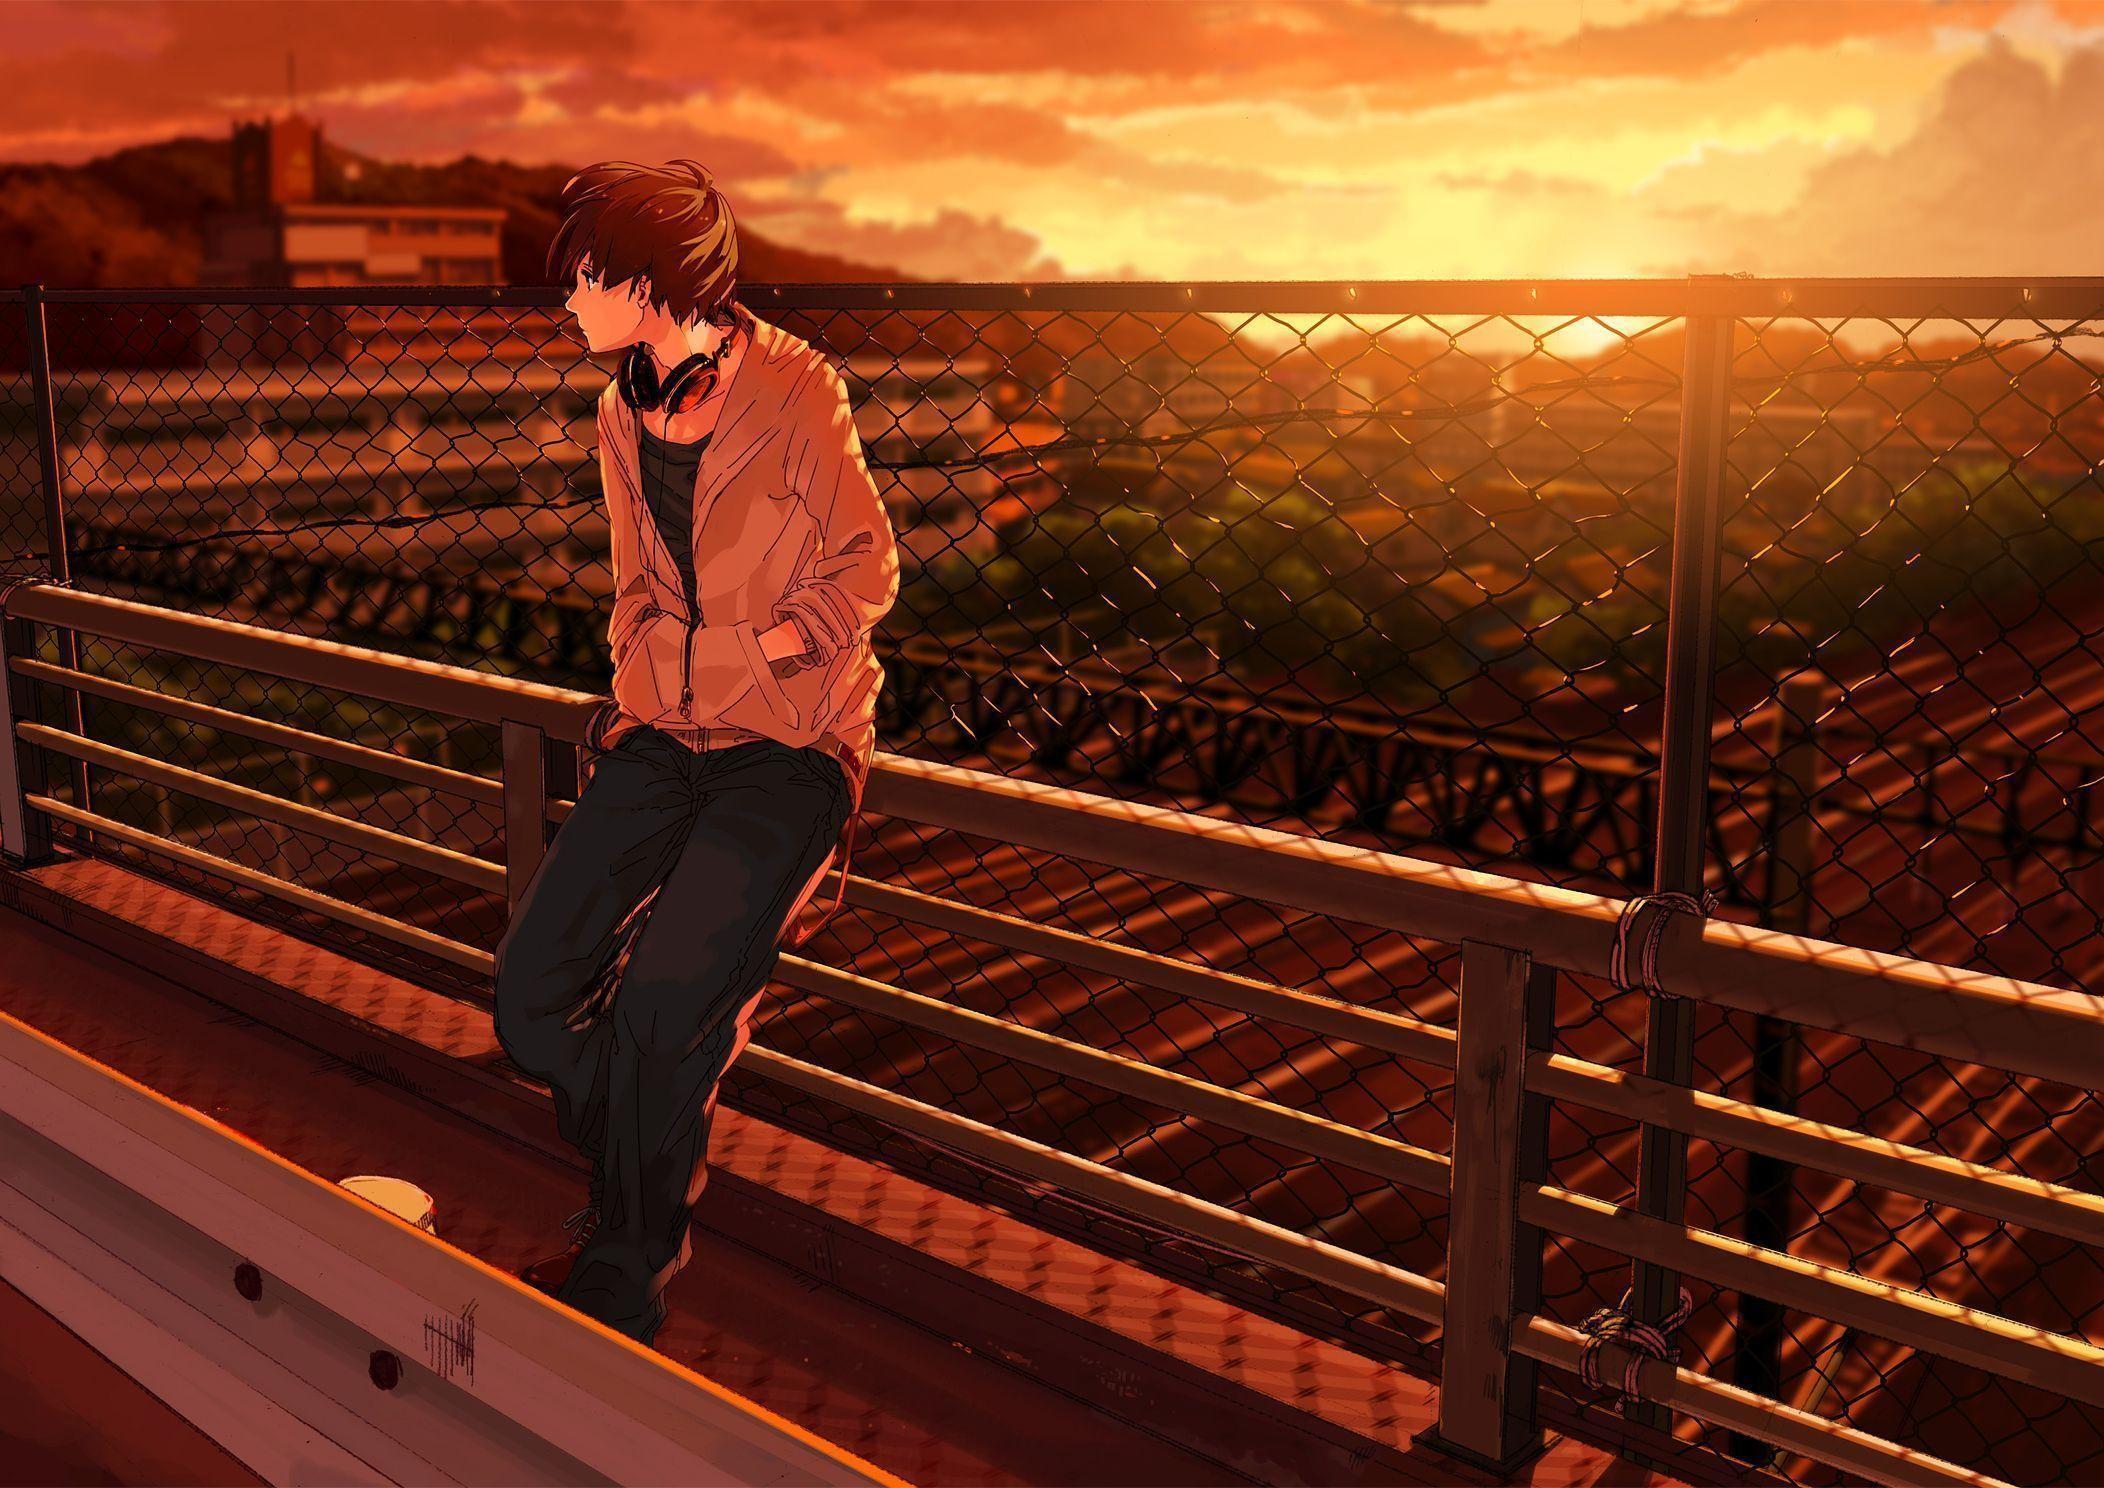 Sad Anime Boy Wallpaper